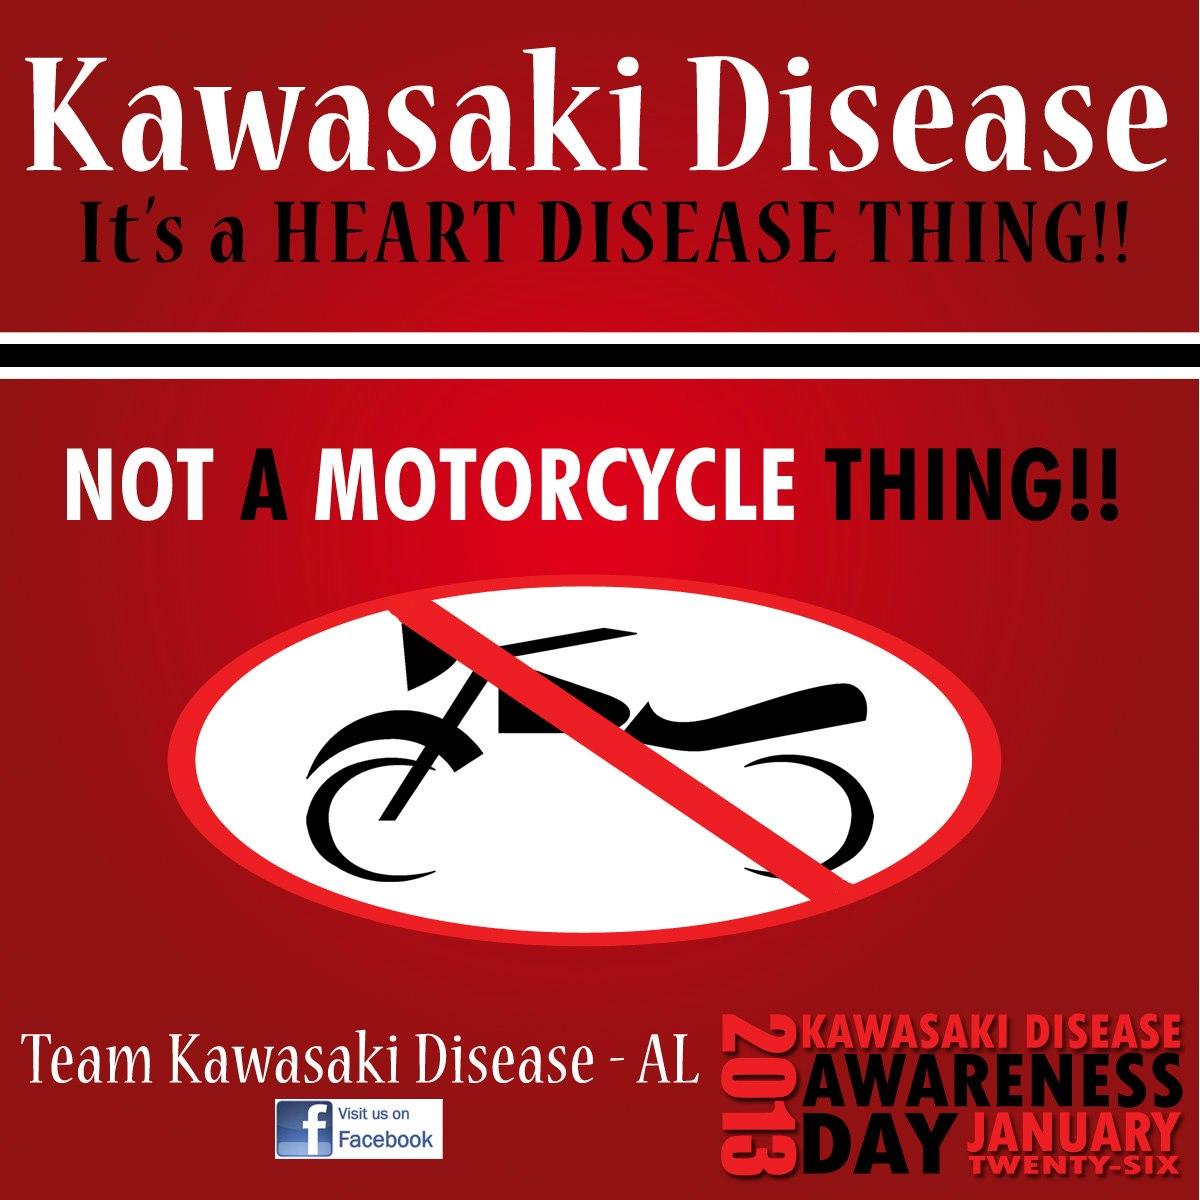 Kawasaki Awareness Day